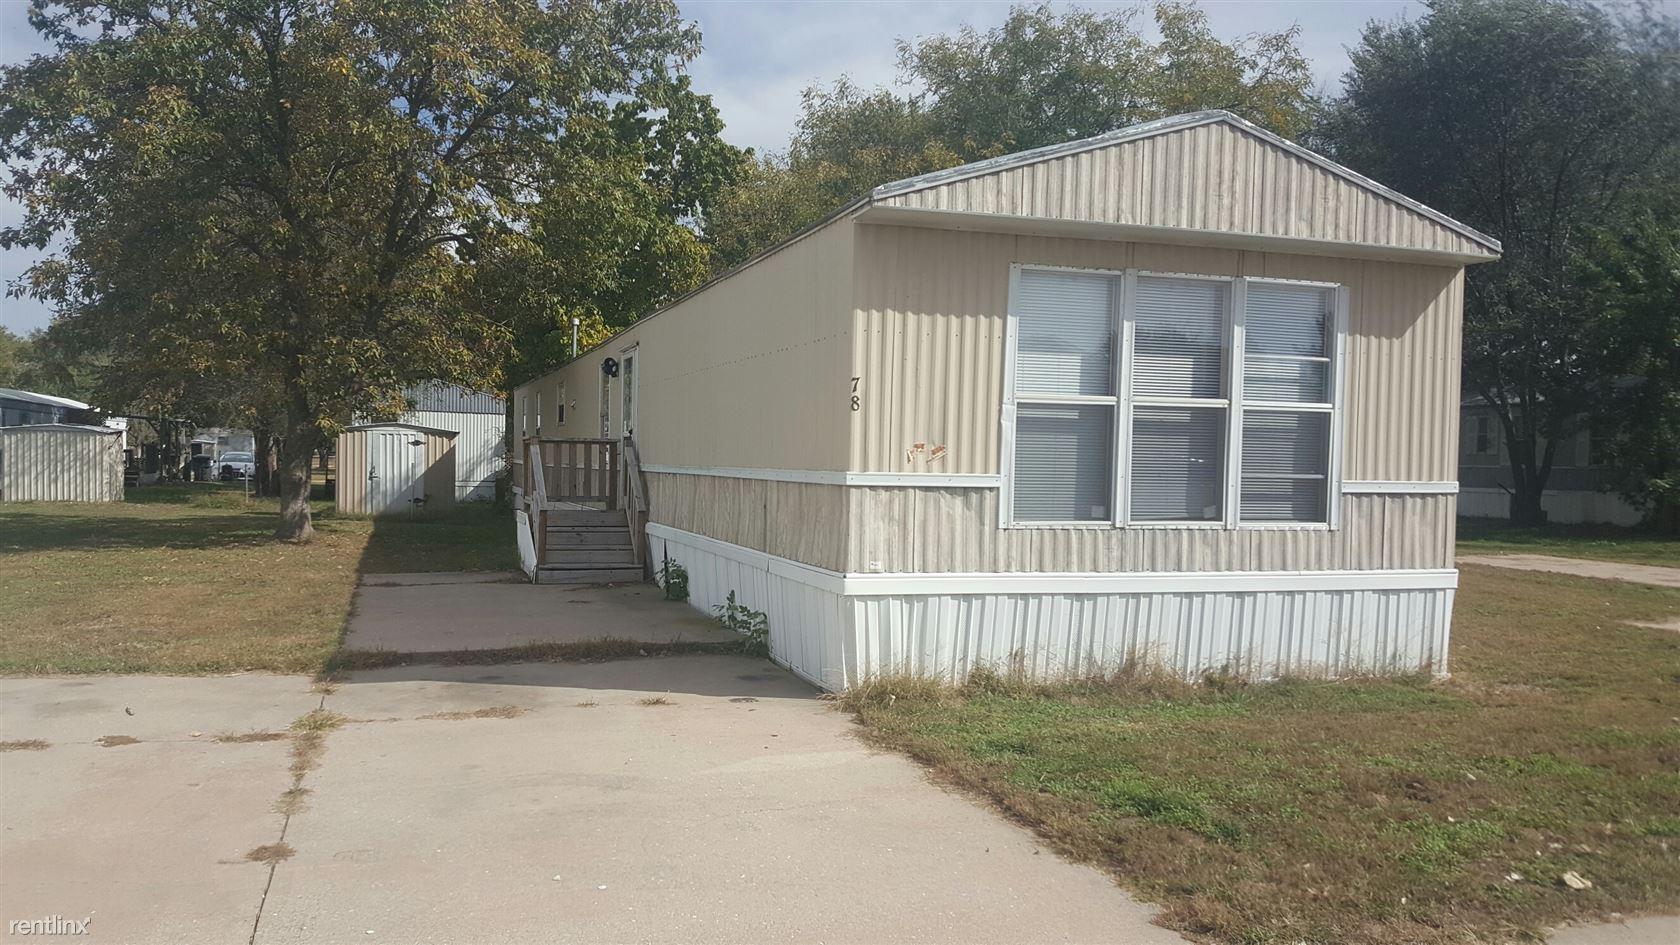 2201 E Macarthur Rd # 78, Wichita, KS 67216